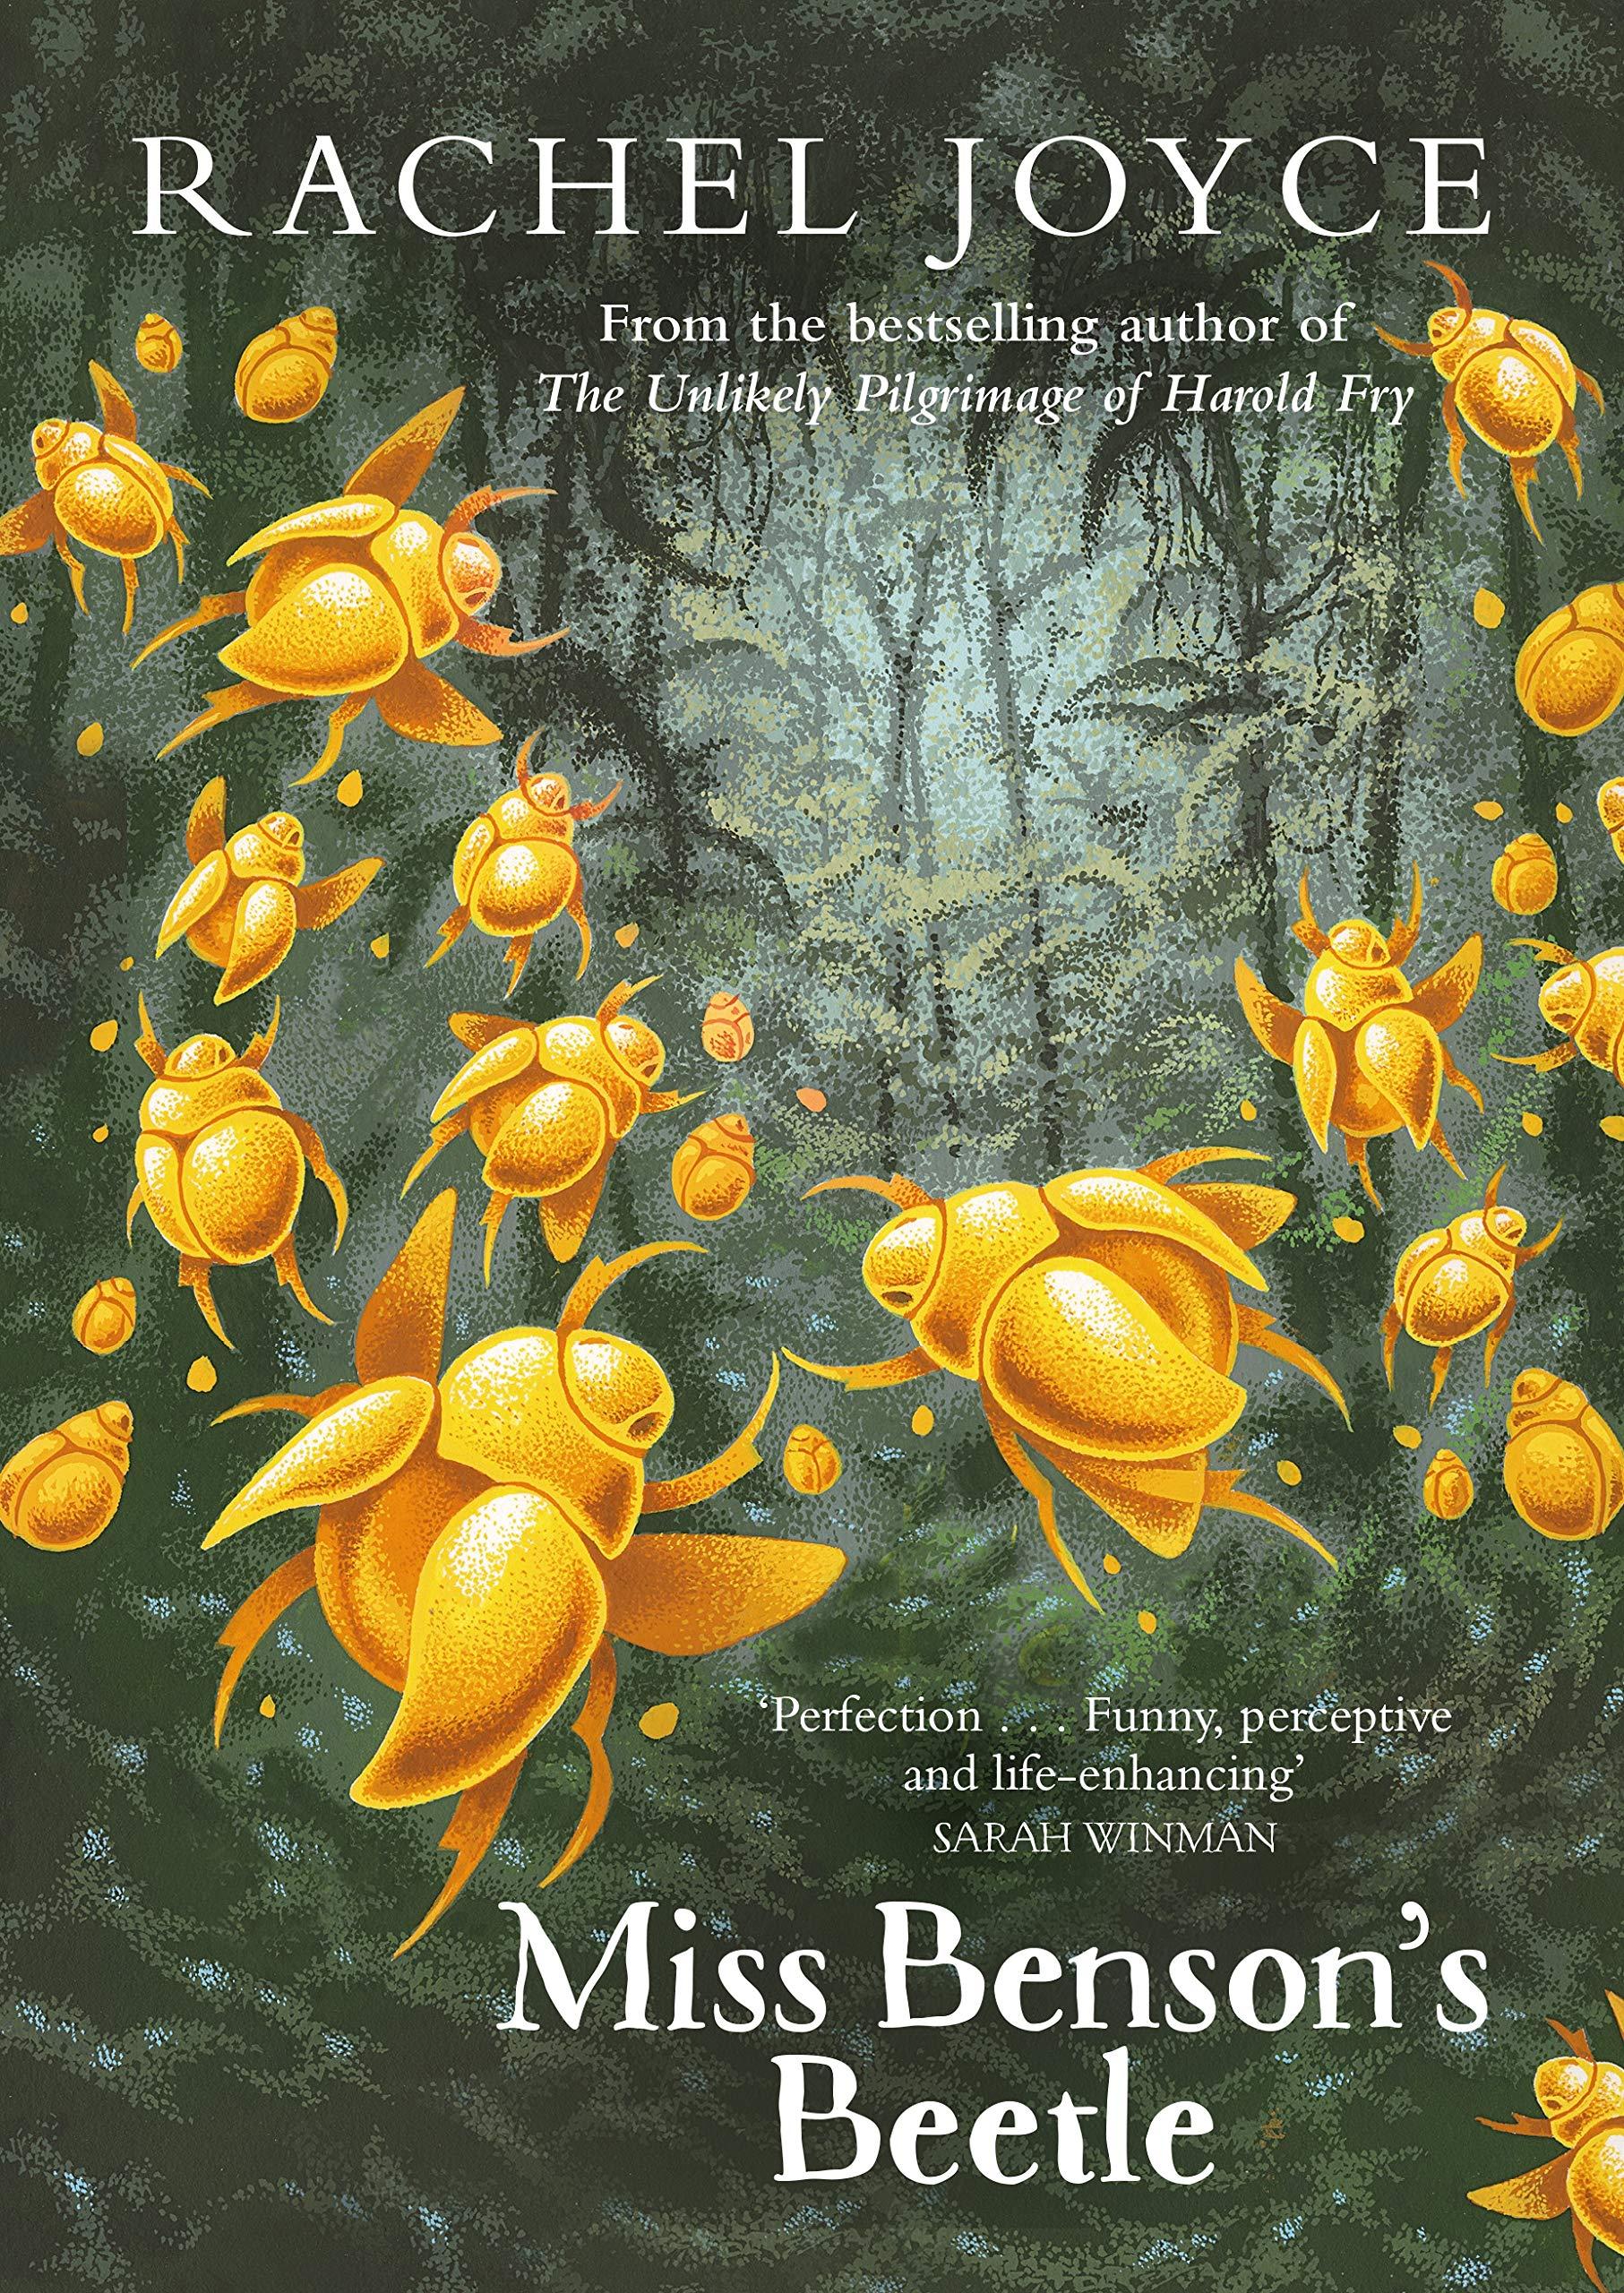 Miss Benson's Beetle | Rachel Joyce | Charlie Byrne's